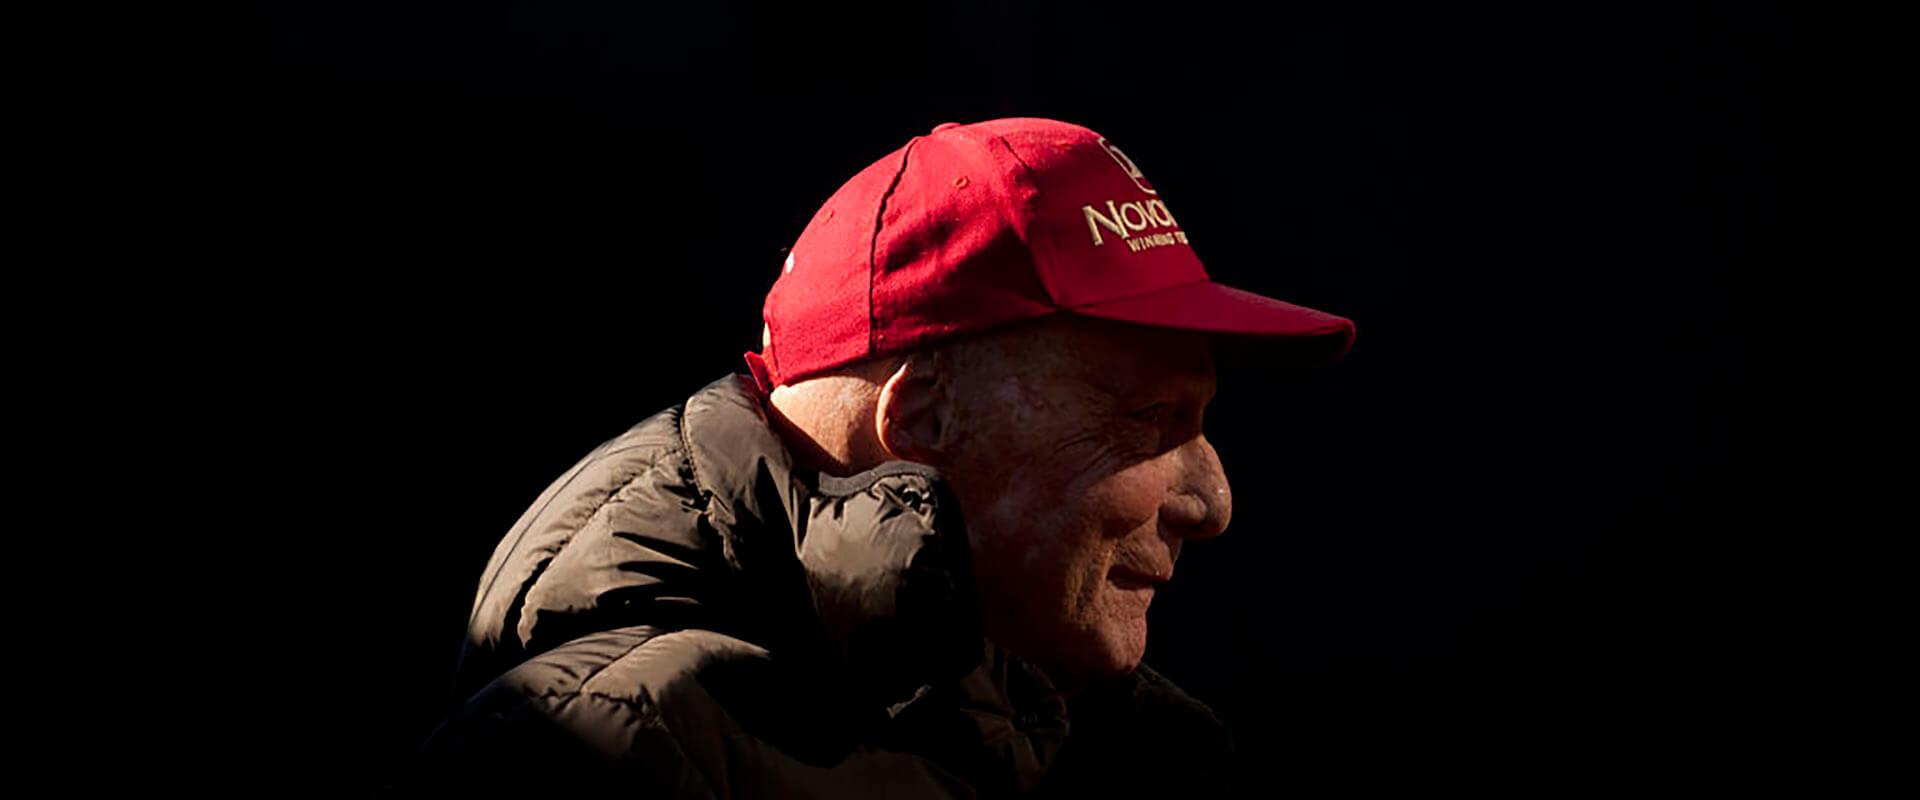 Niki Lauda – Uma lenda das pistas. (Final)